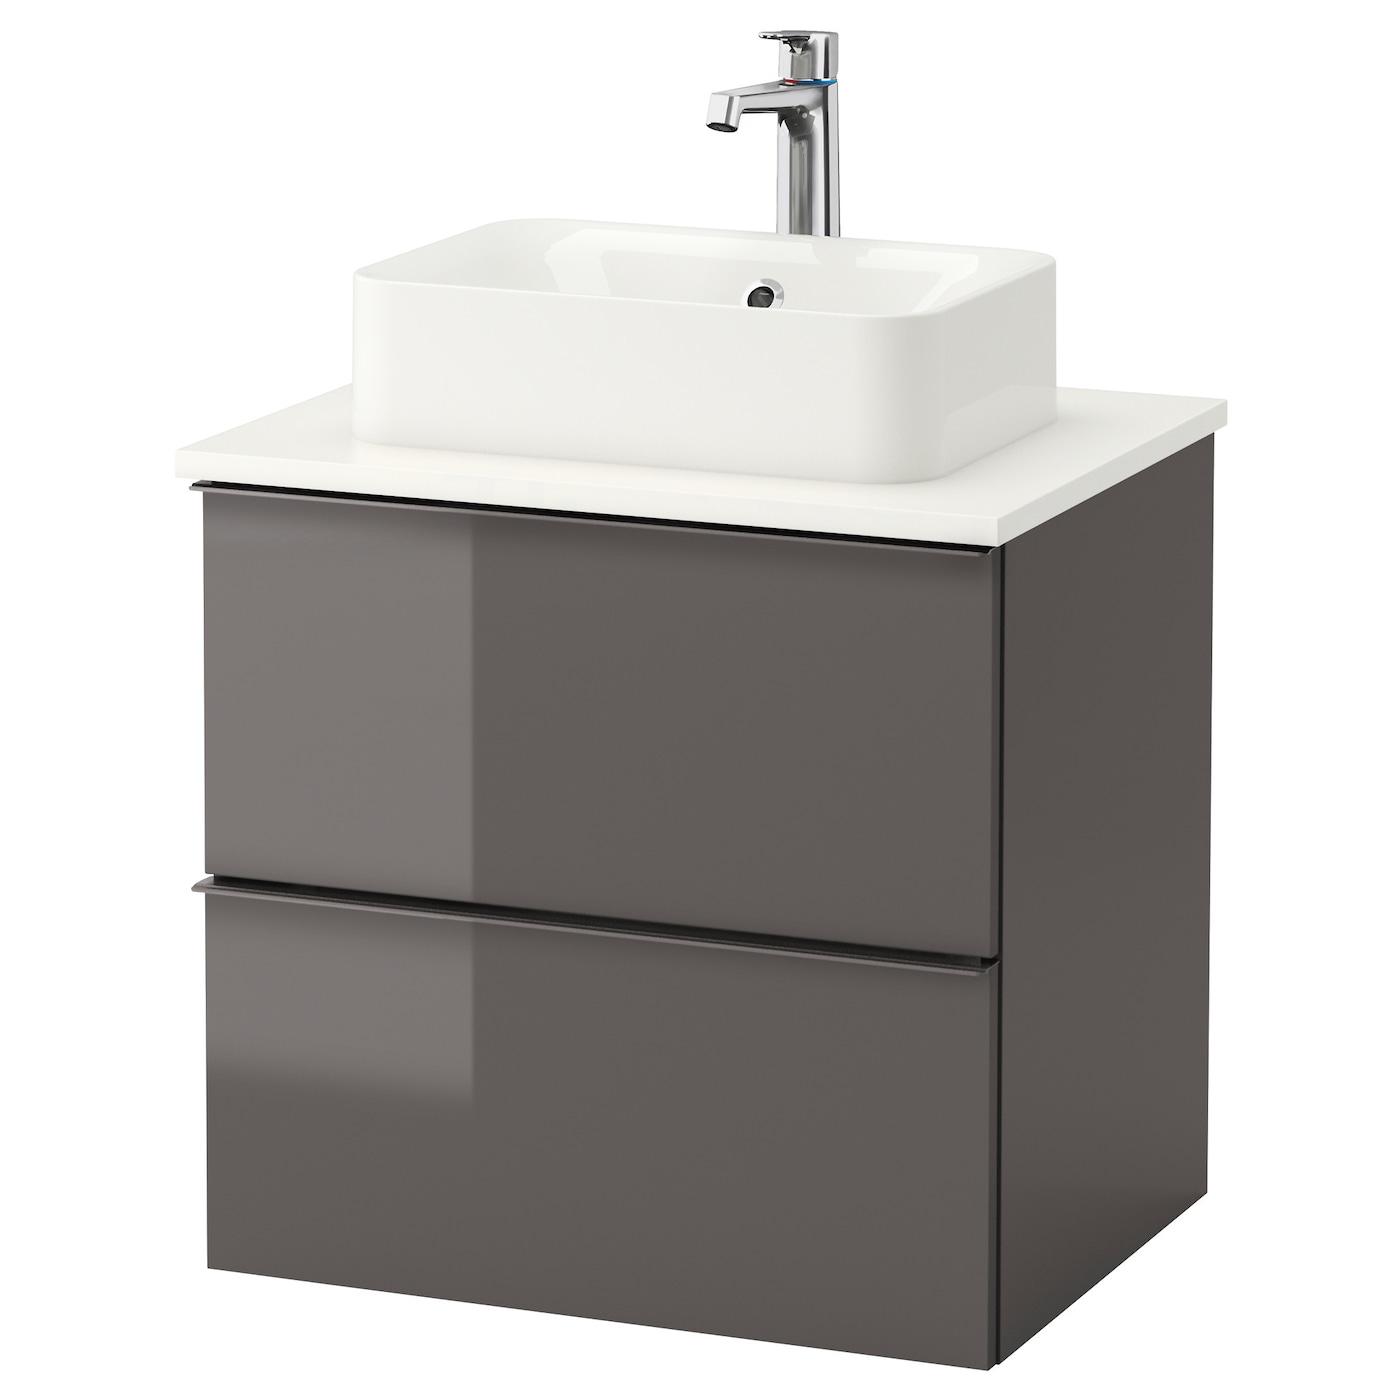 IKEA H–RVIK GODMORGON TOLKEN wastafel bi 45x32 v bovenblad